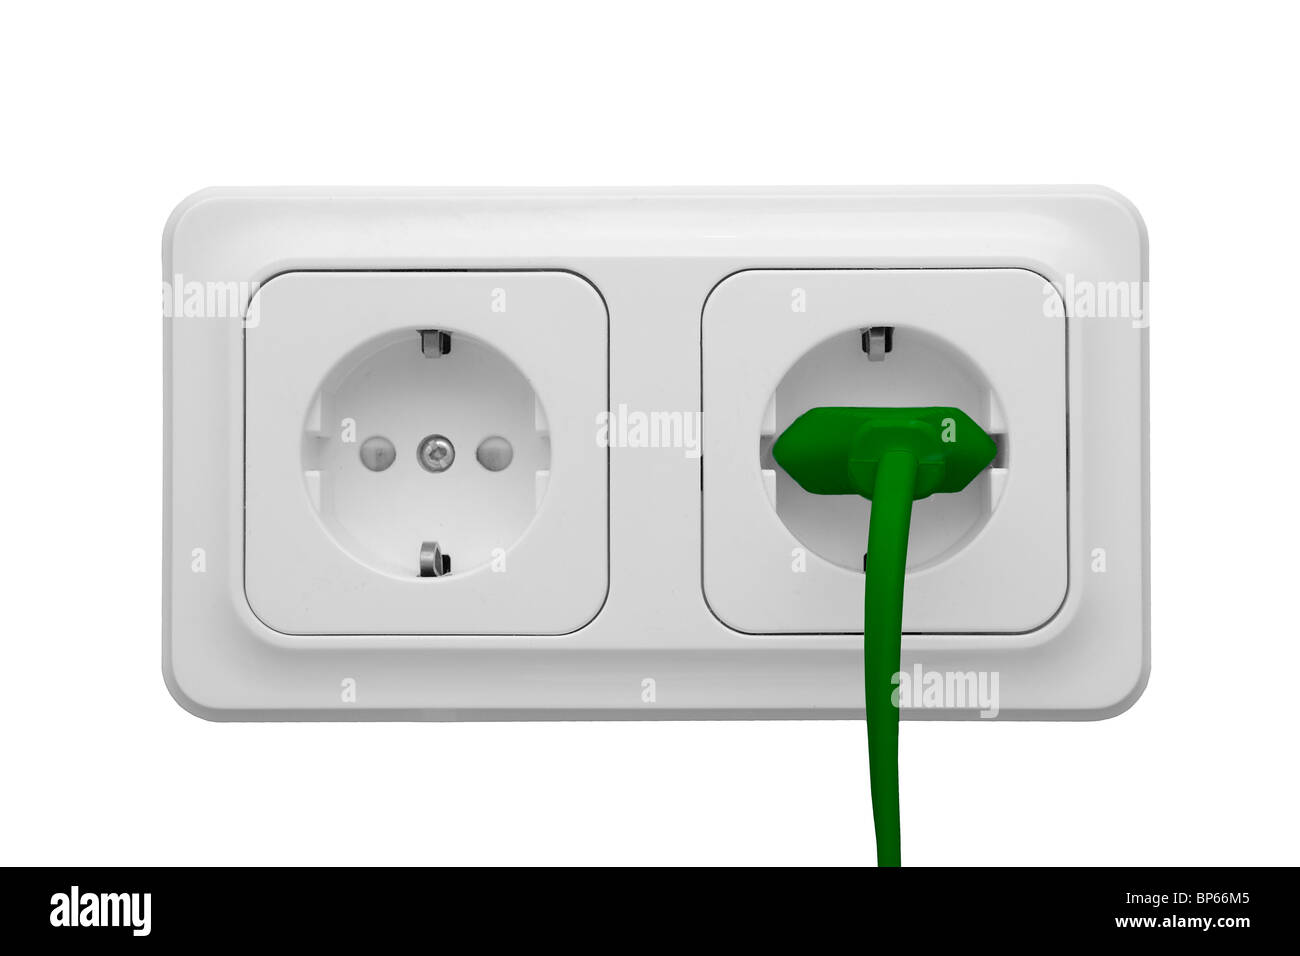 Toma de corriente con cable de alimentación aislado sobre fondo blanco. Imagen De Stock